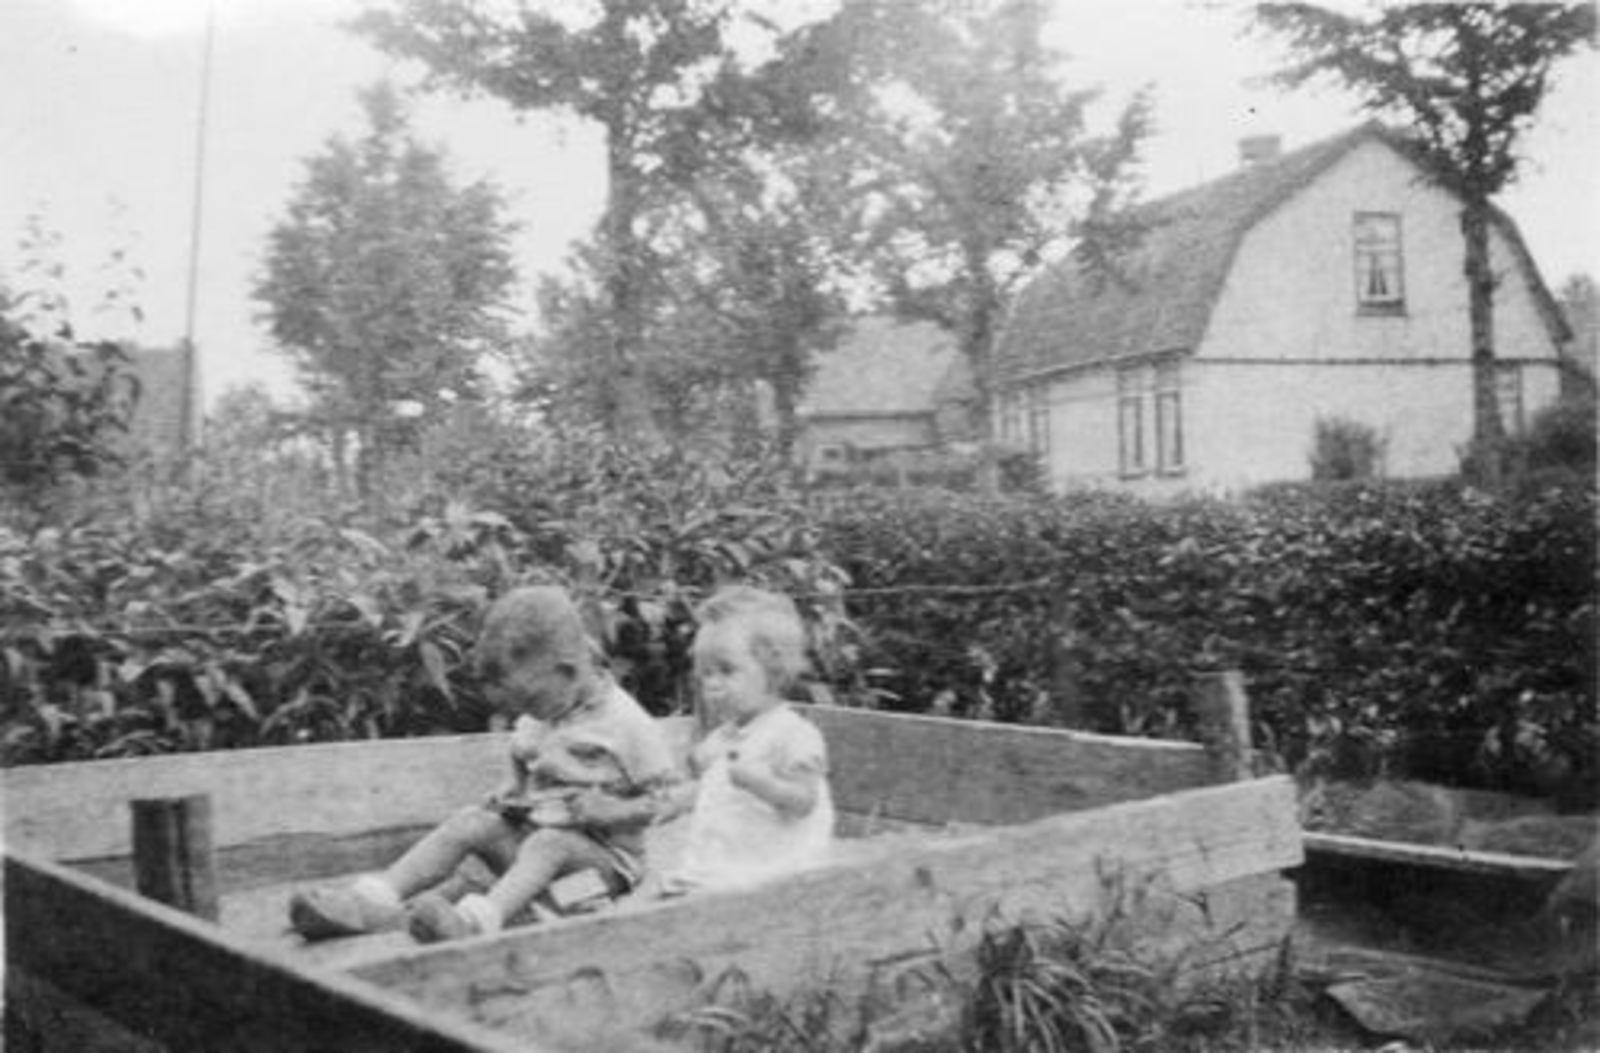 Fortweg W 0039 1944± Huize Koolbergen met Kinderen in Zandbak 02